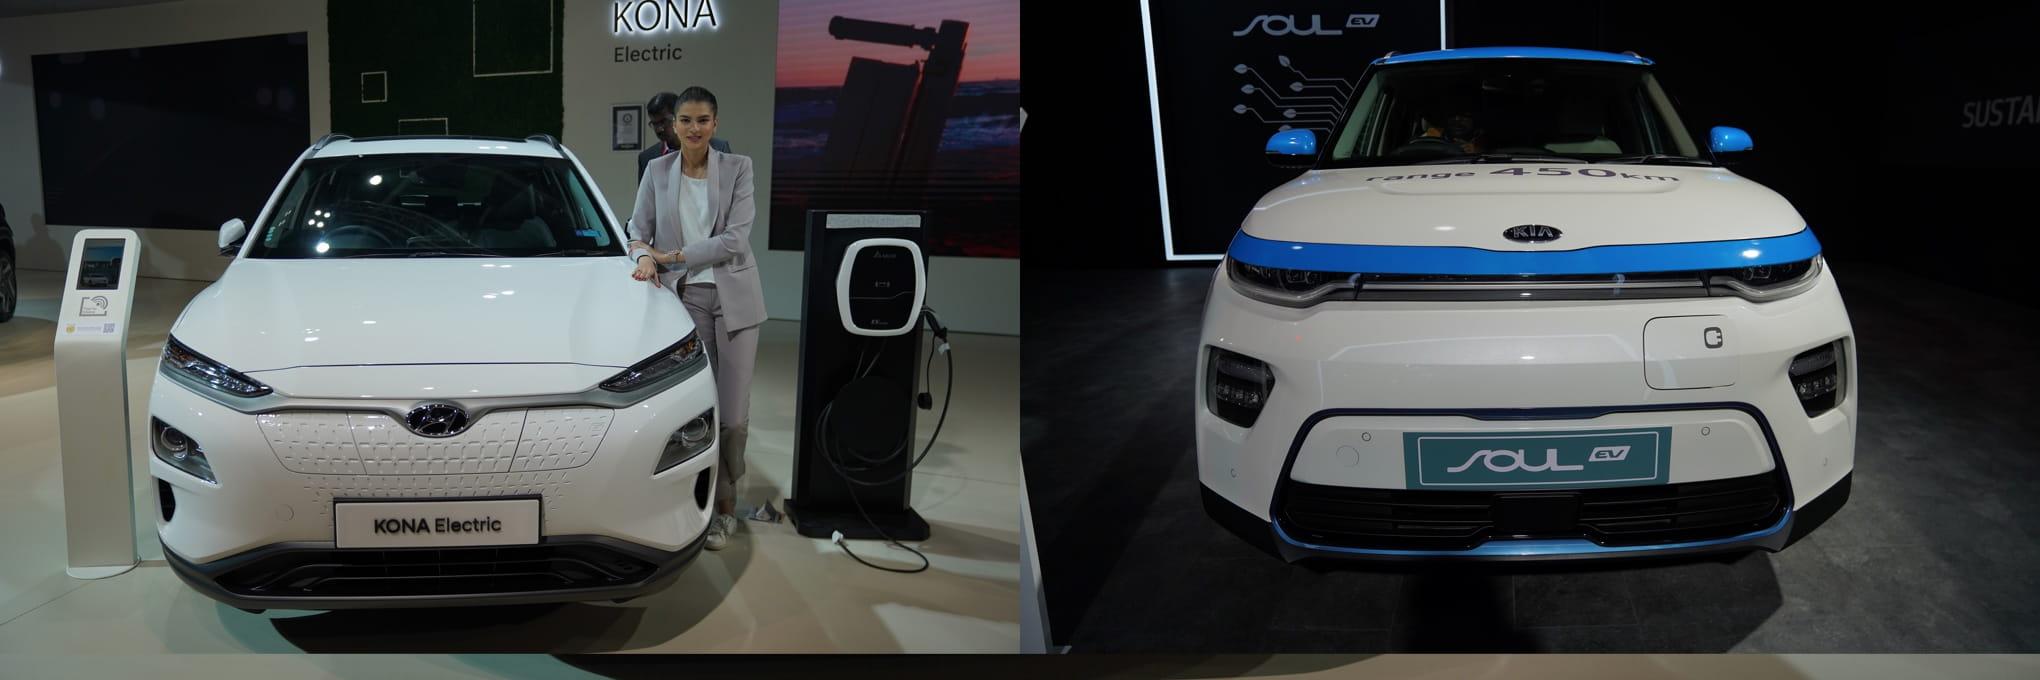 Hyundai Kona and Kia Soul electric